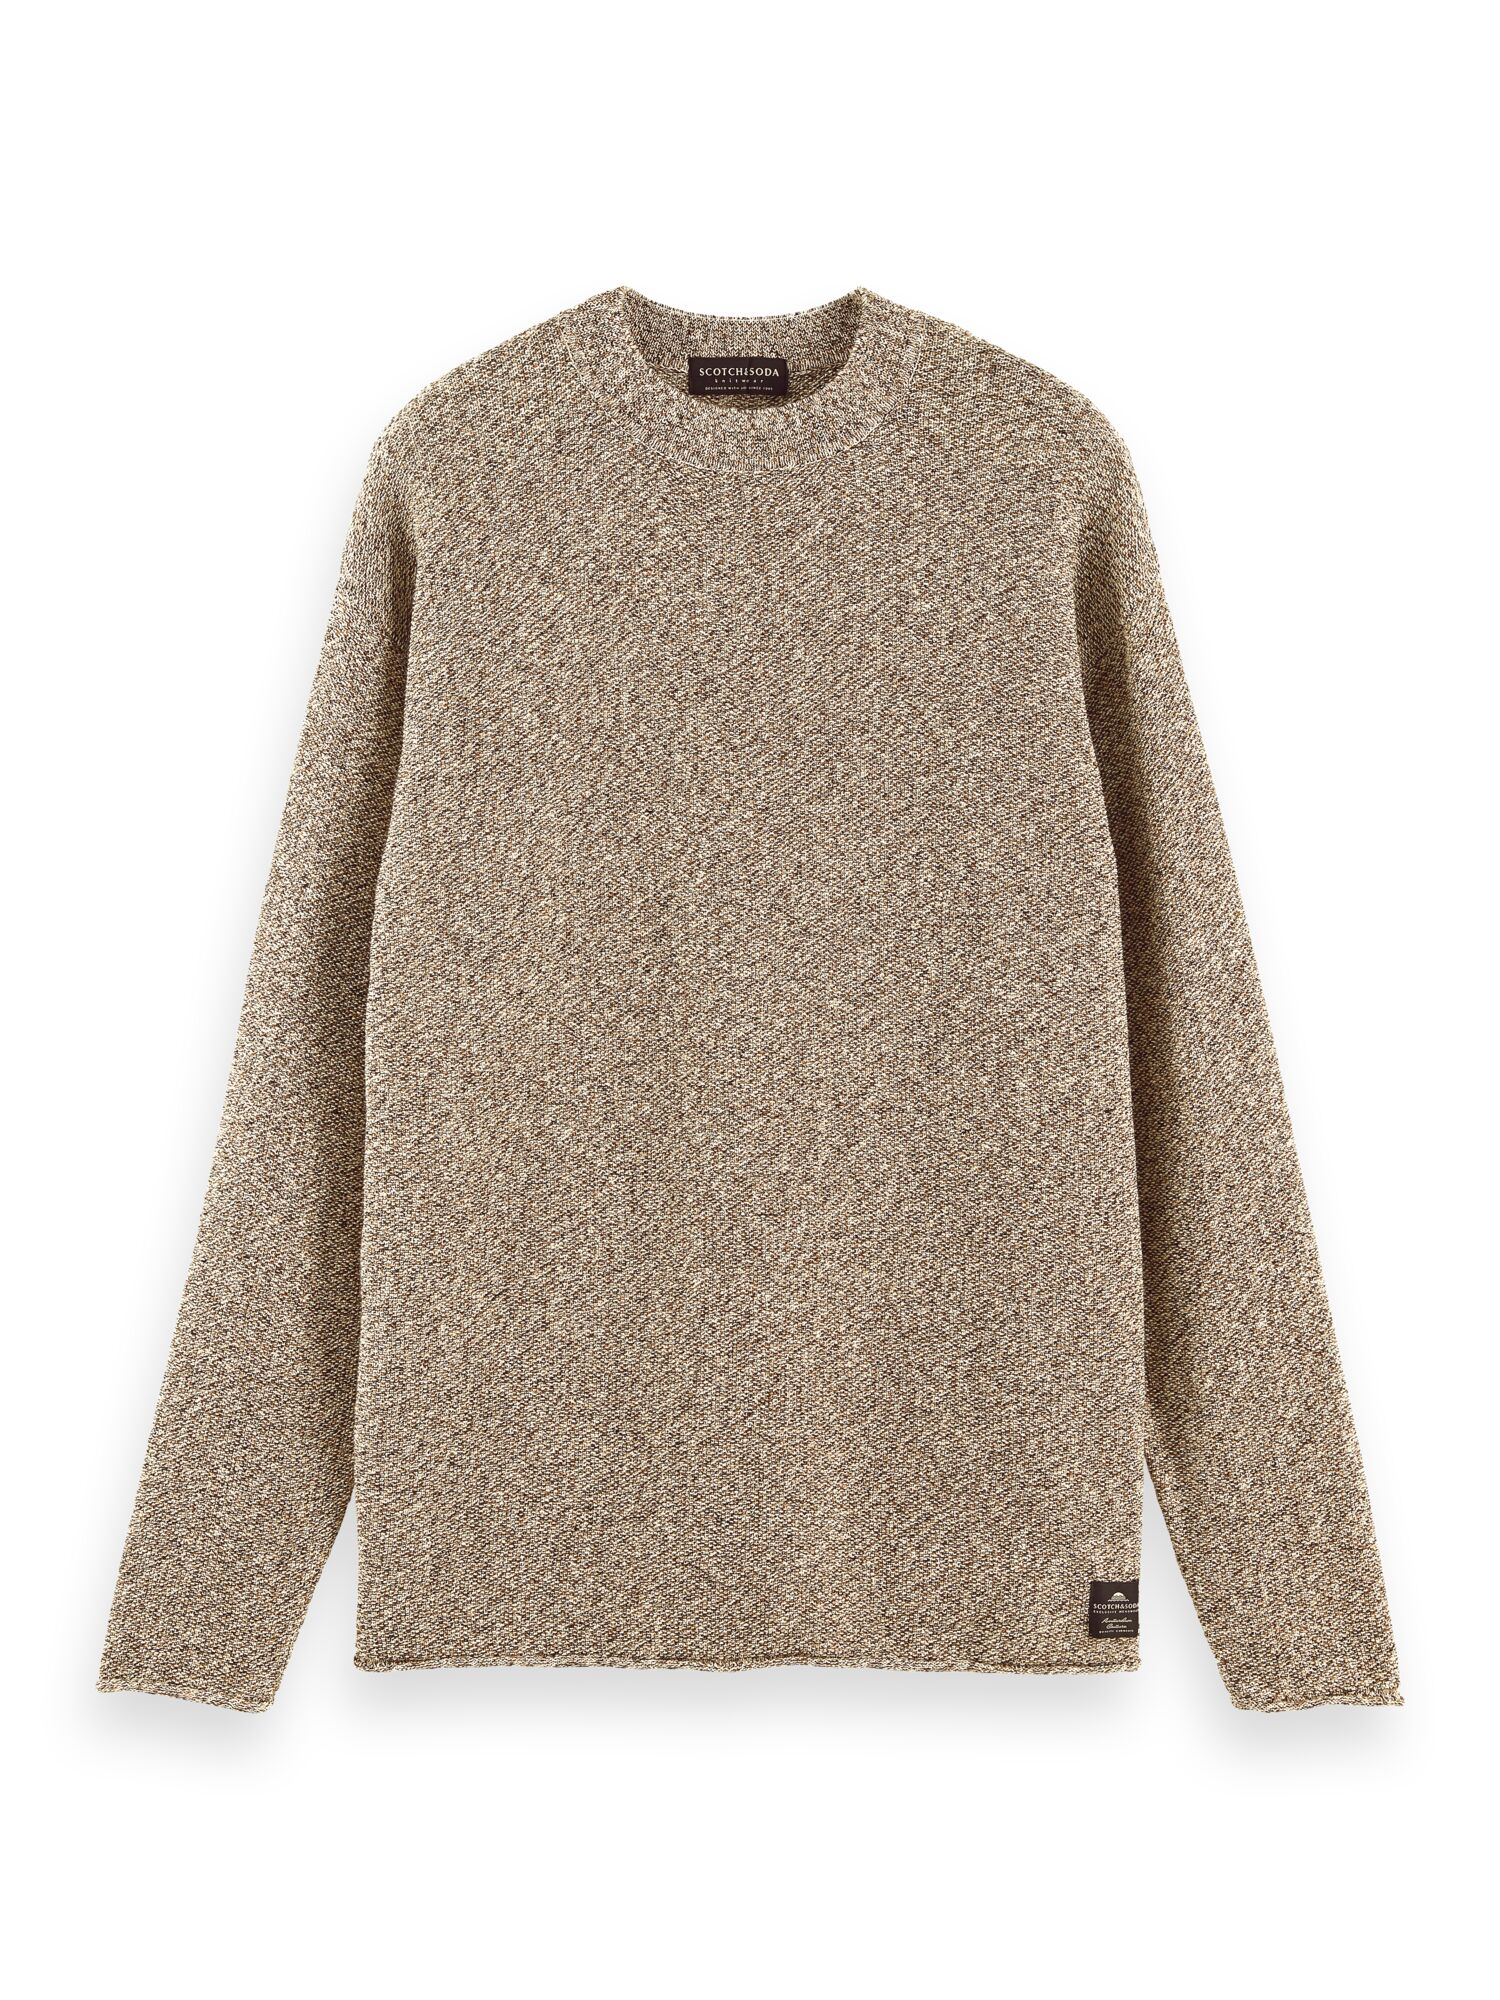 Scotch & Soda | Lightweight cotton linen blend pull in structured knit